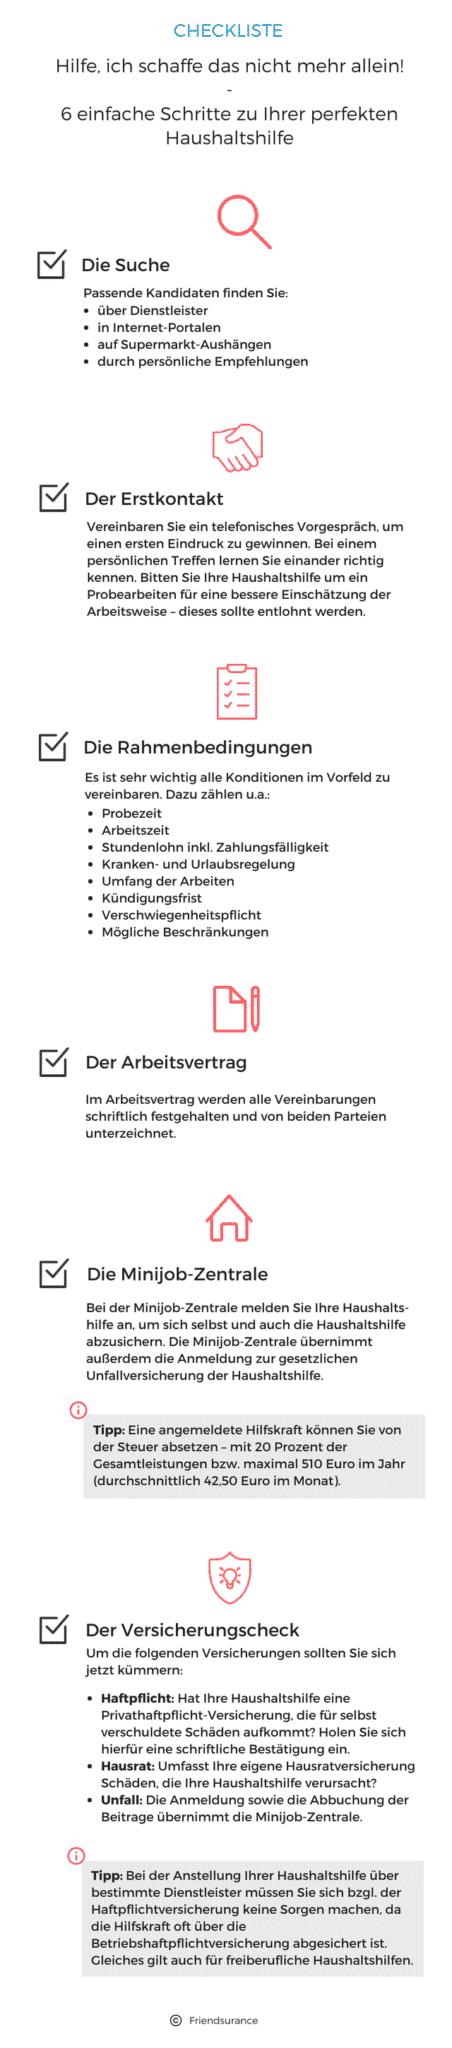 Haushaltshilfe_Checkliste